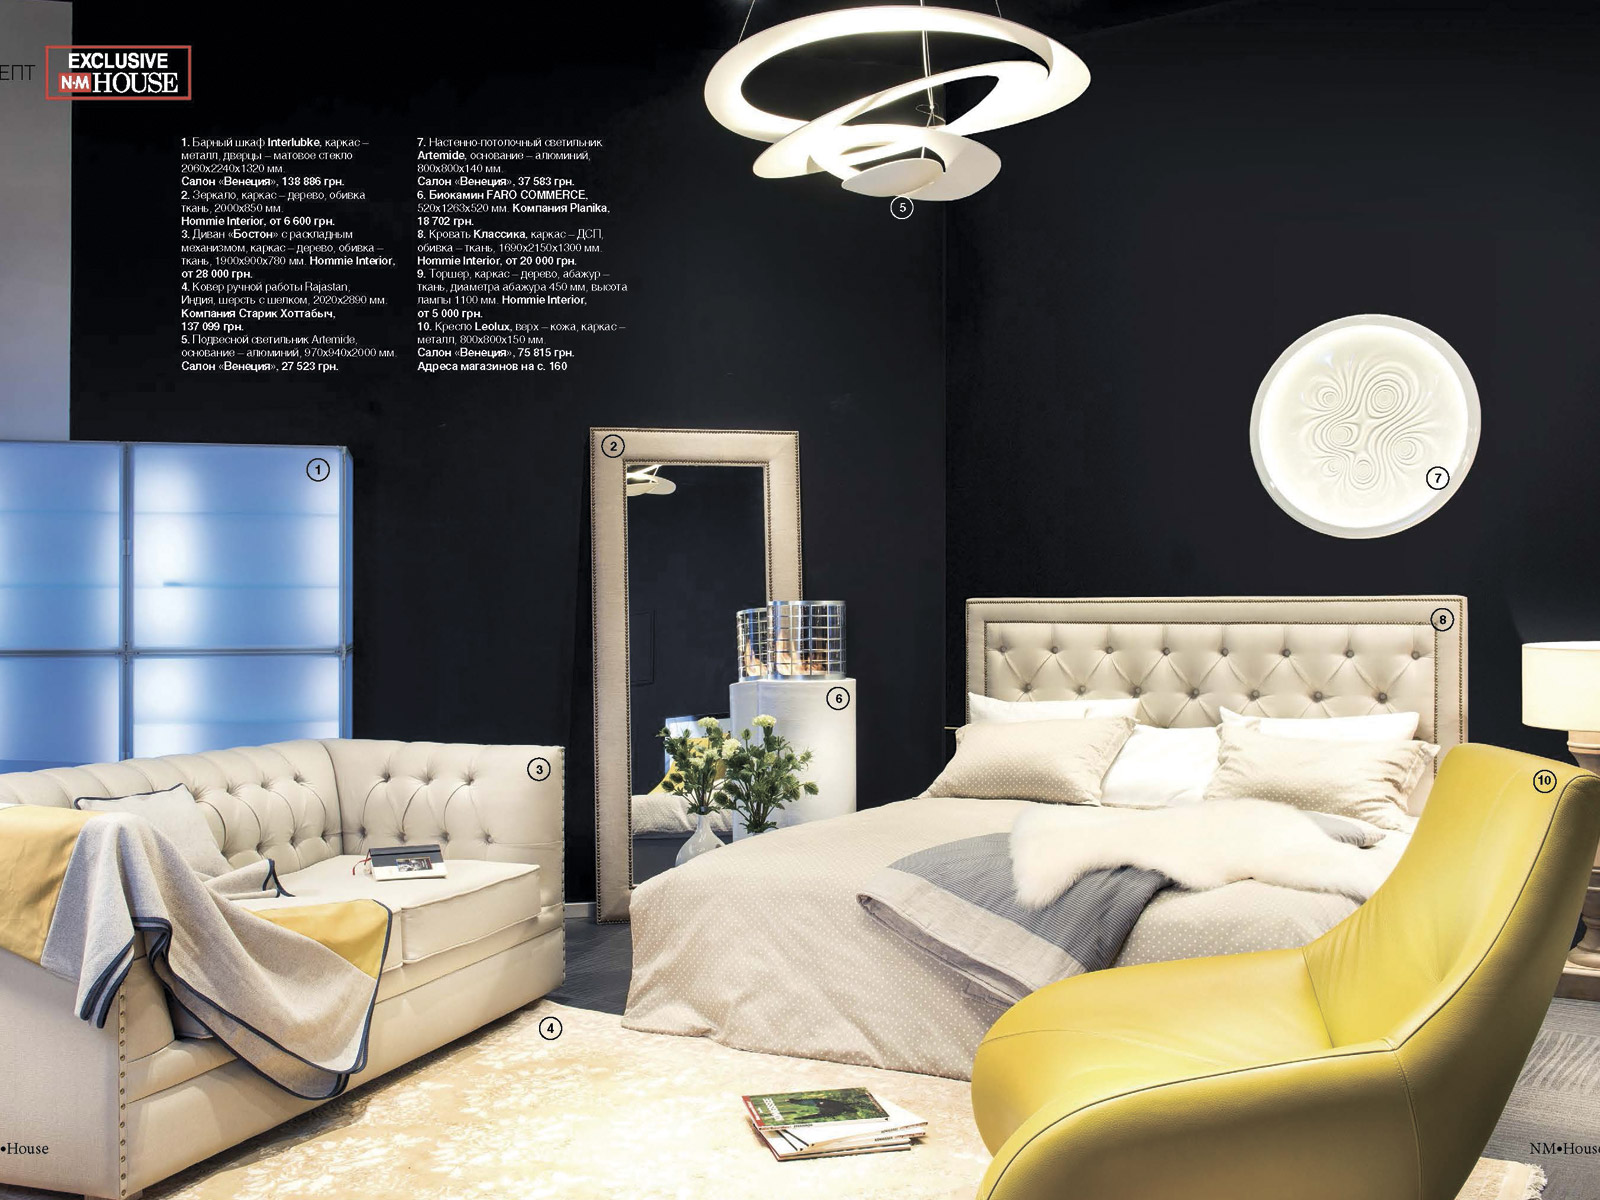 Концептуальная съемка для журнала NM HOUSE. Мобильный биокамин Planika Faro Commerce. Биокамин для спальни.